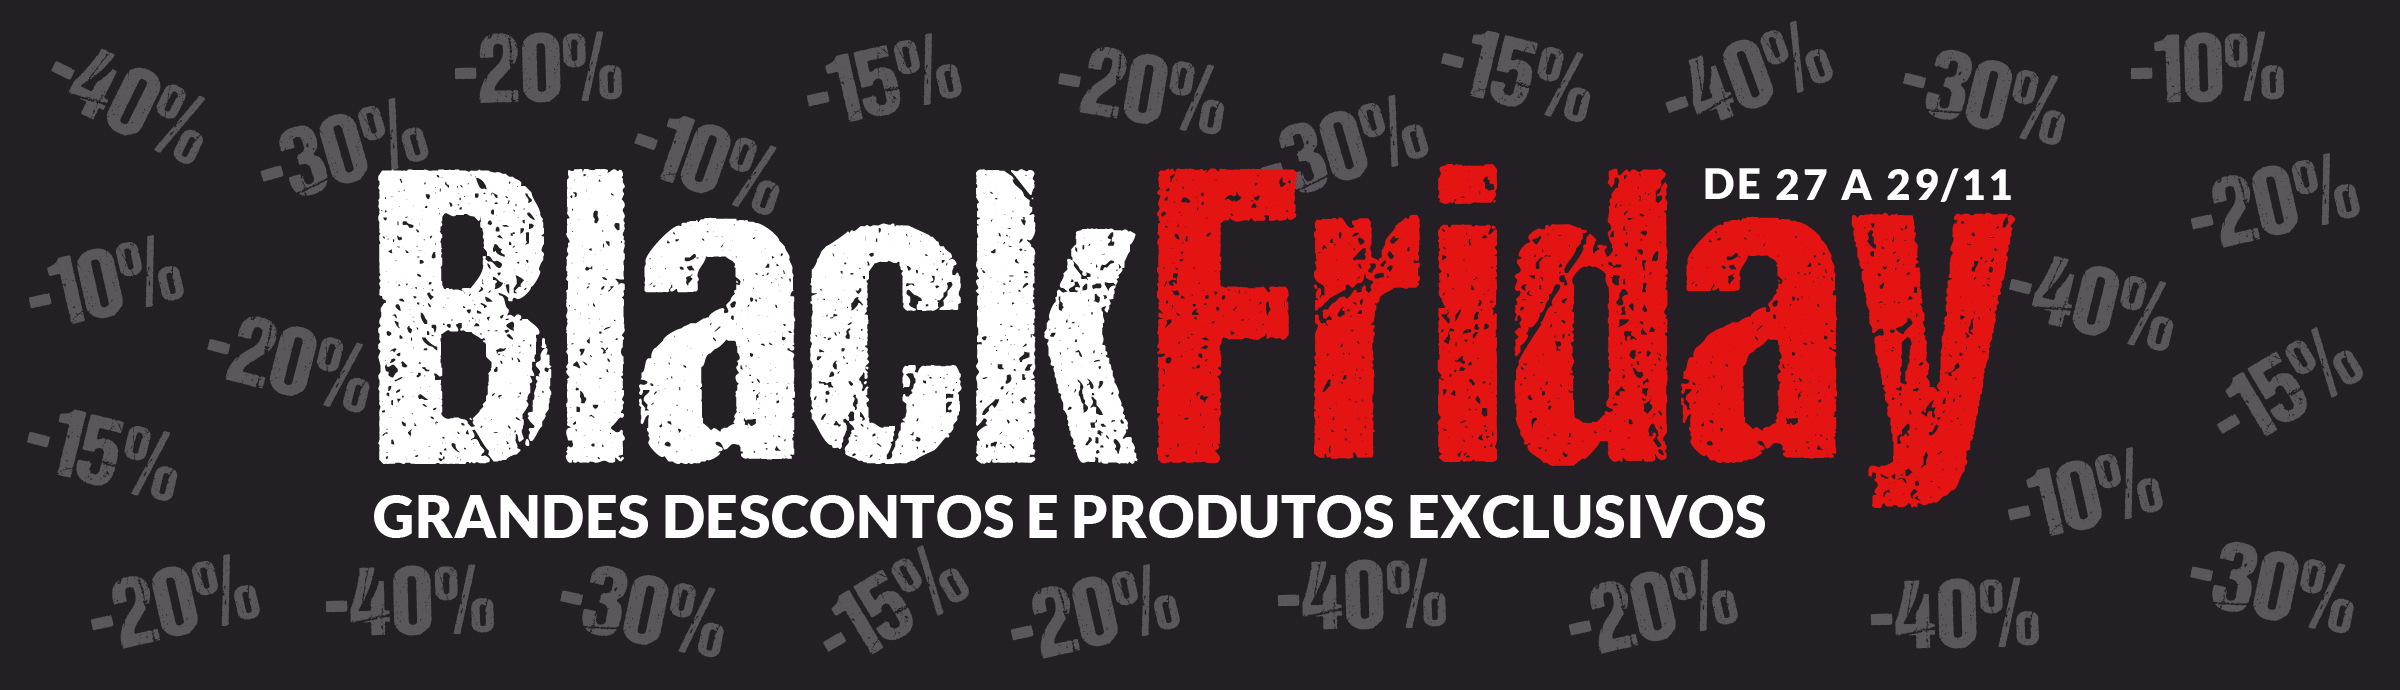 Black Friday Brinquedos 2020